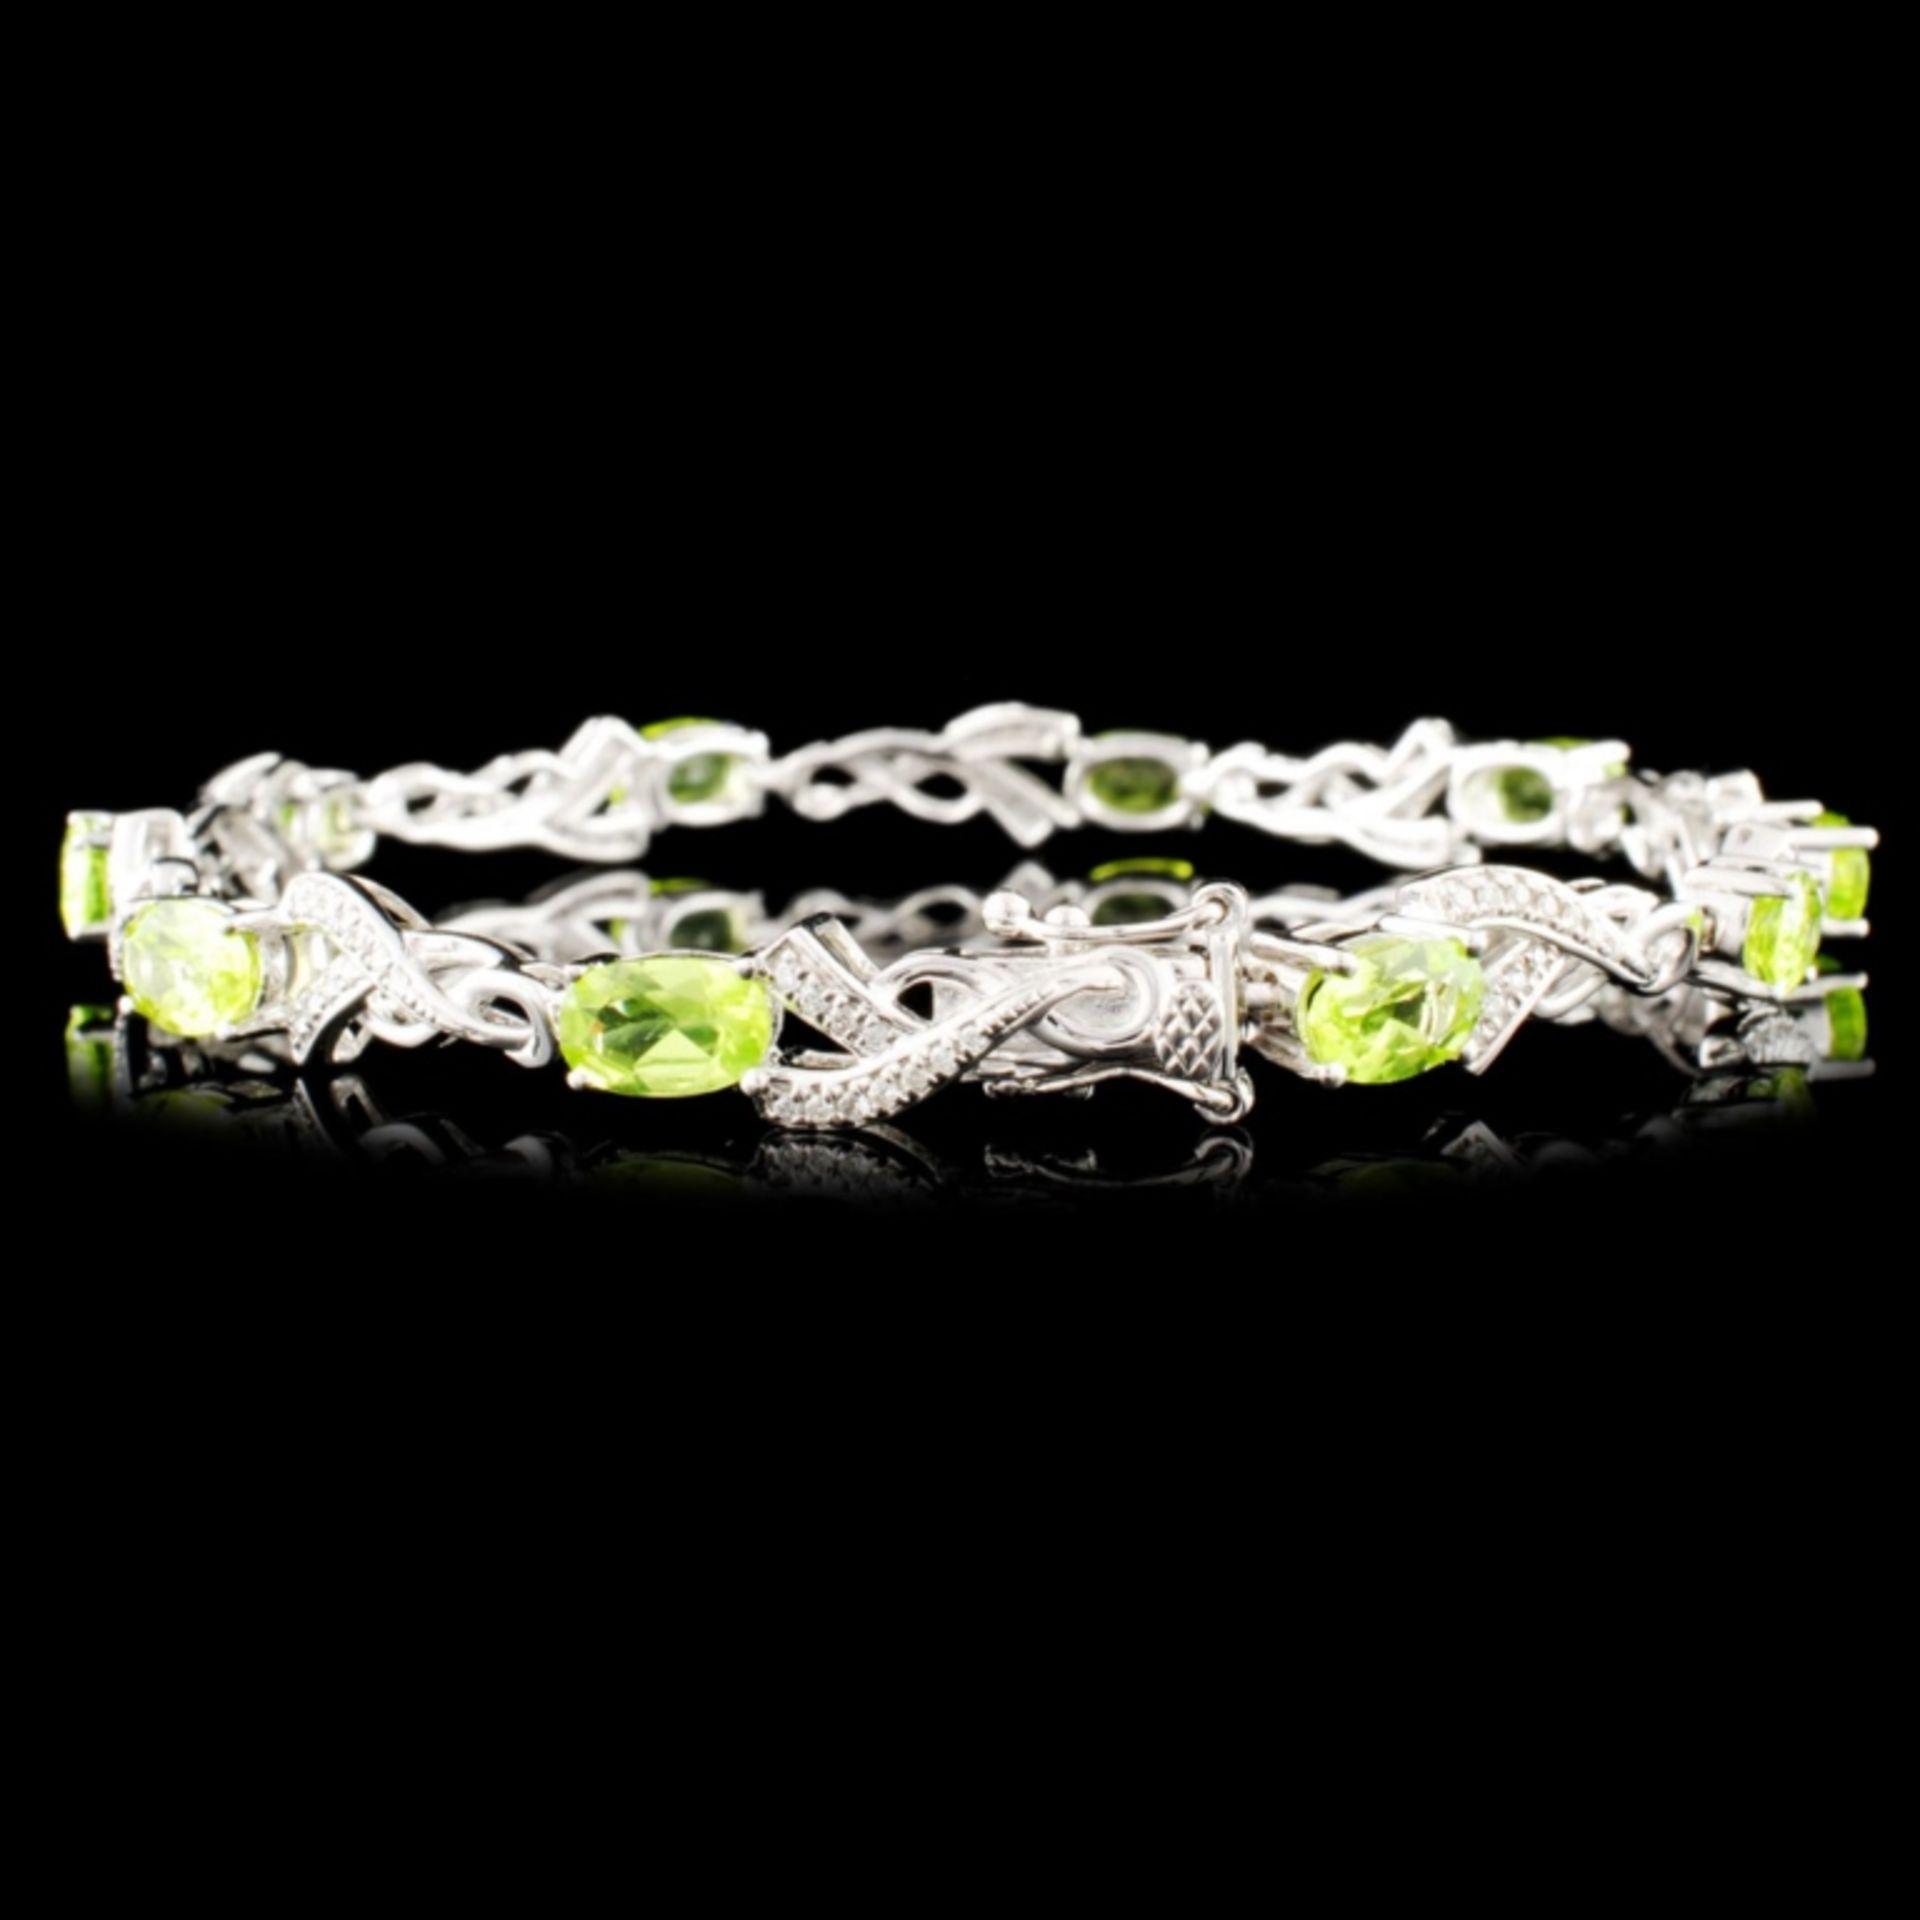 14K Gold 4.60ct Peridot & 0.31ctw Diamond Bracelet - Image 2 of 4